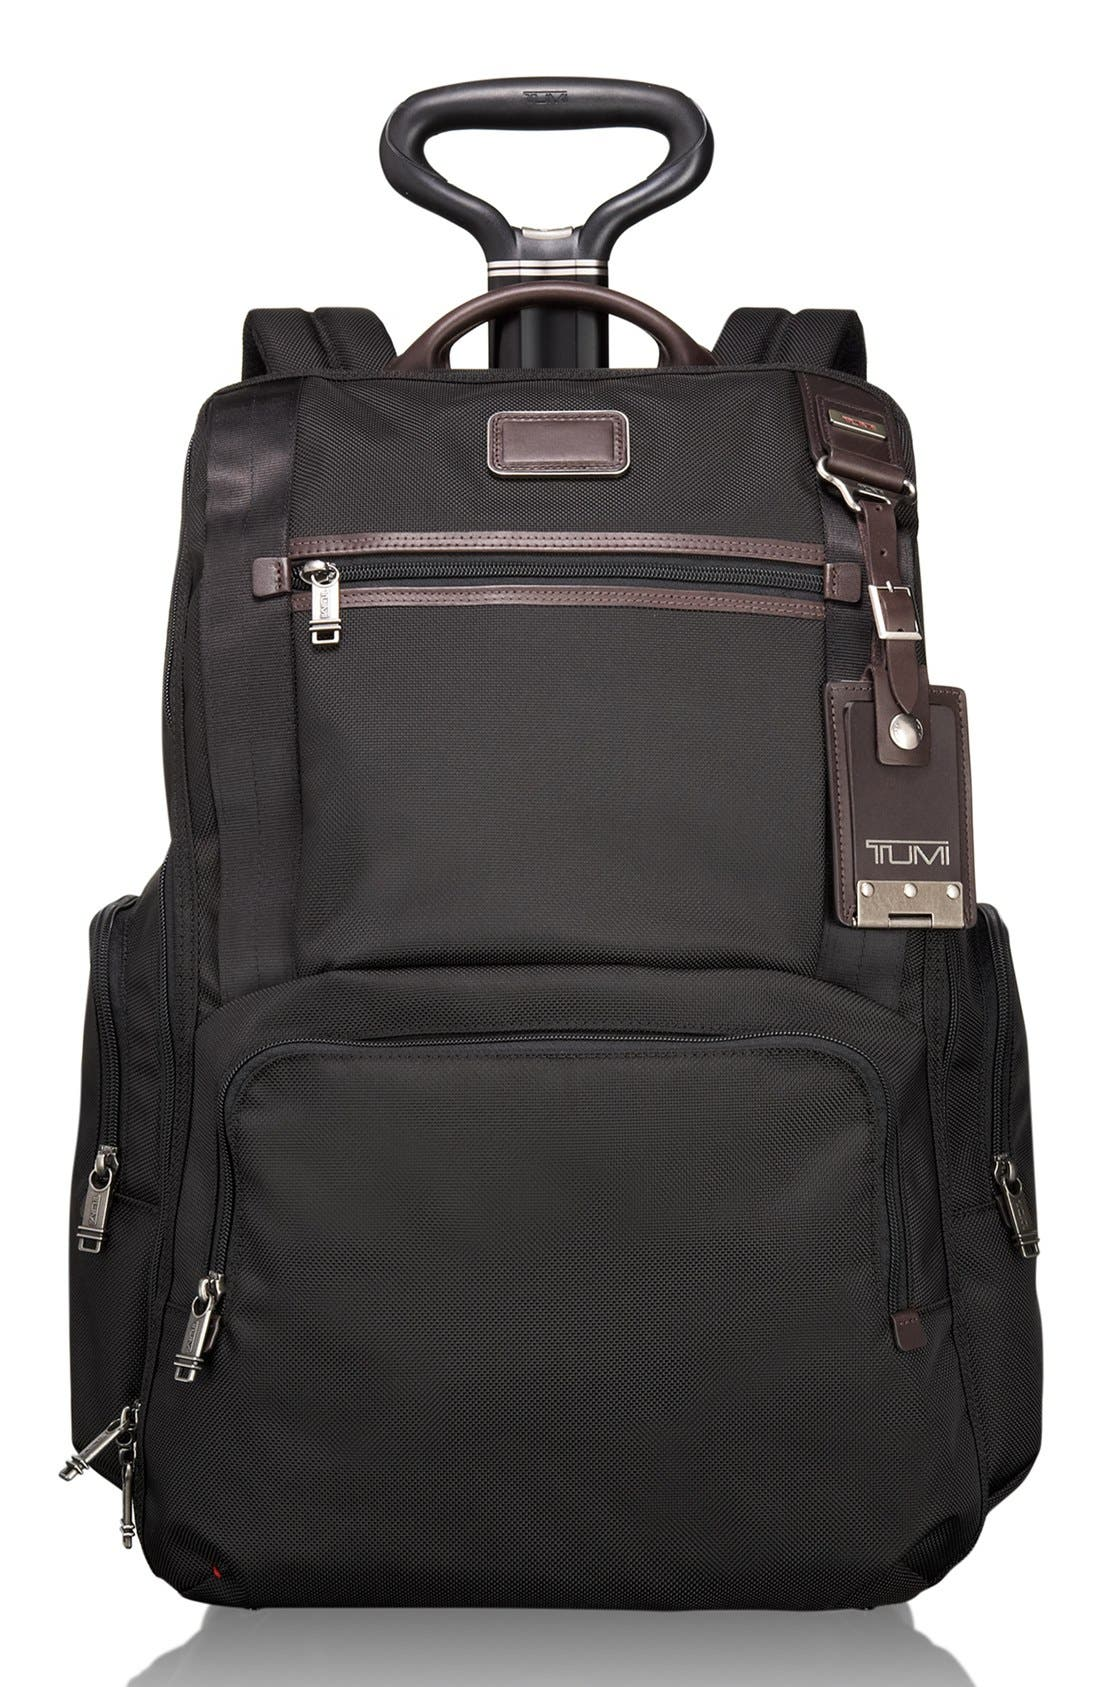 Alternate Image 1 Selected - Tumi 'Alpha Bravo - Lemoore' Wheeled Backpack (21 Inch)